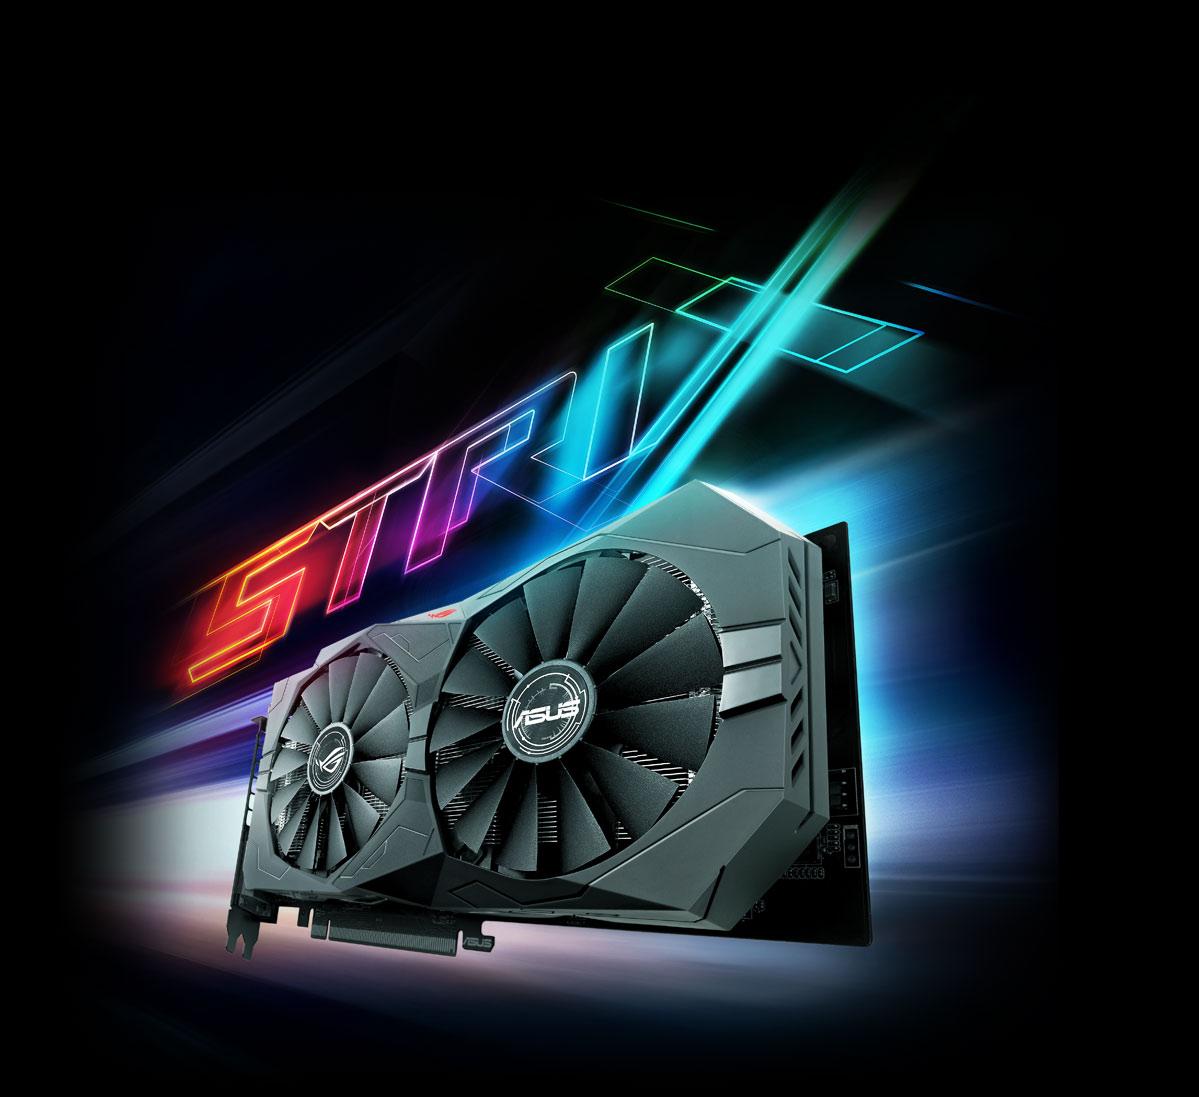 ROG-STRIX-RX570-4G-GAMING | Graphics Cards | ASUS Global